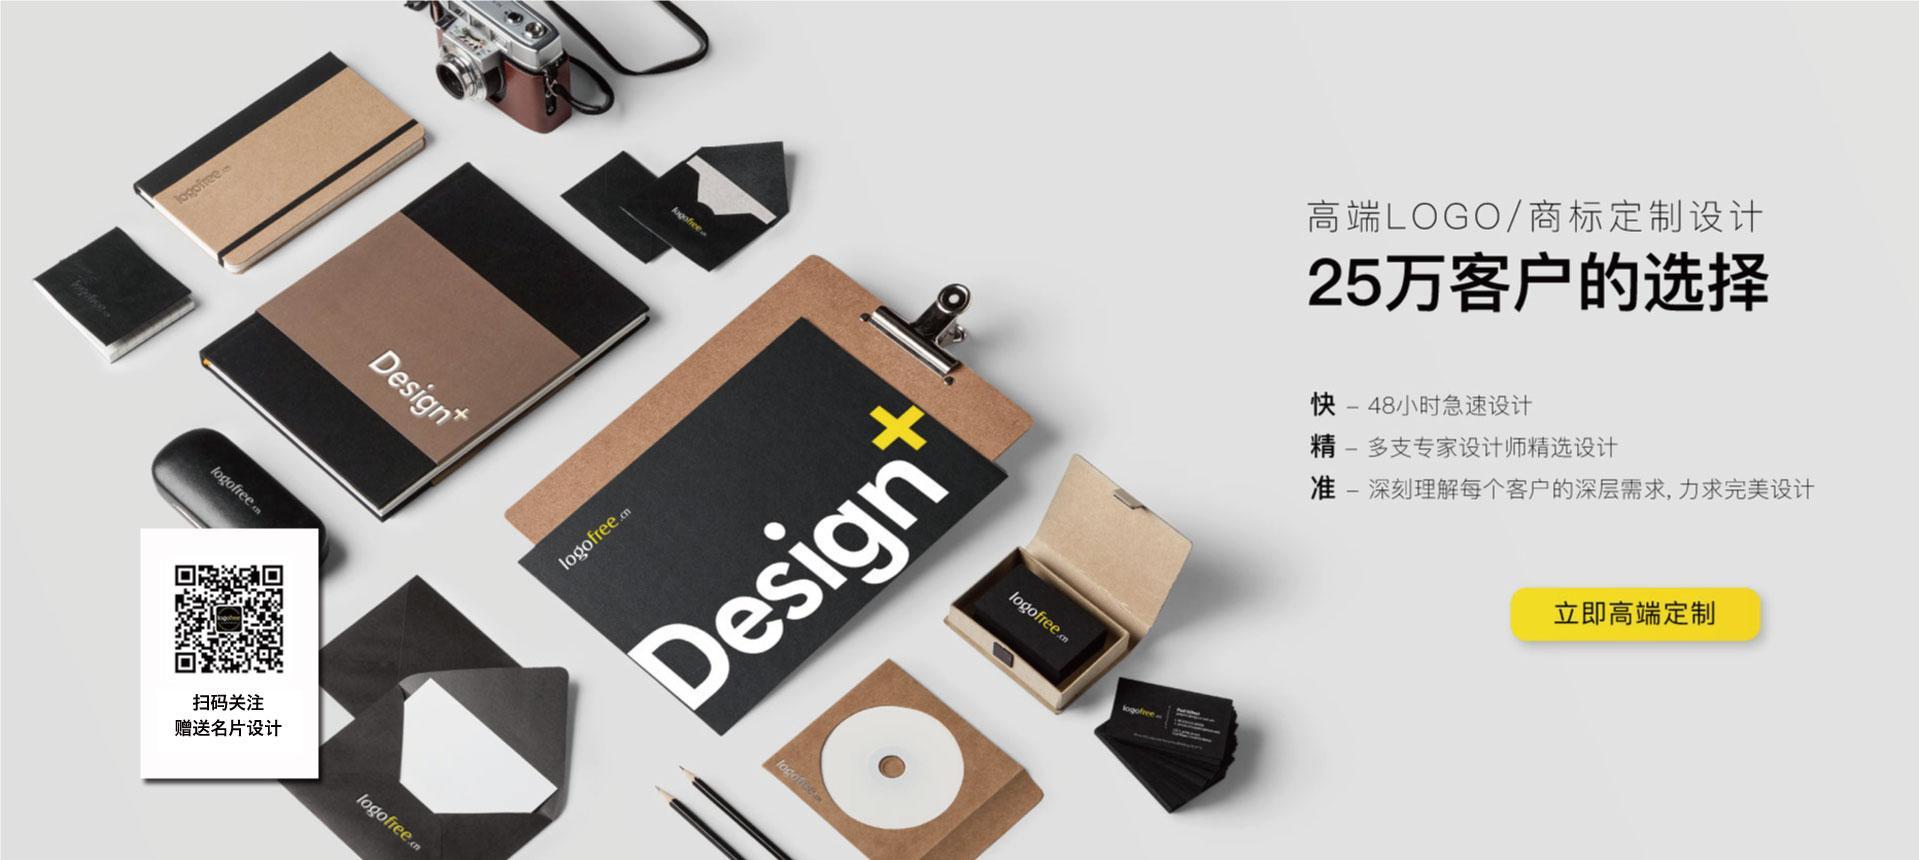 logofree,国内唯一提供源文件的在线标志设计、商标设计平台。